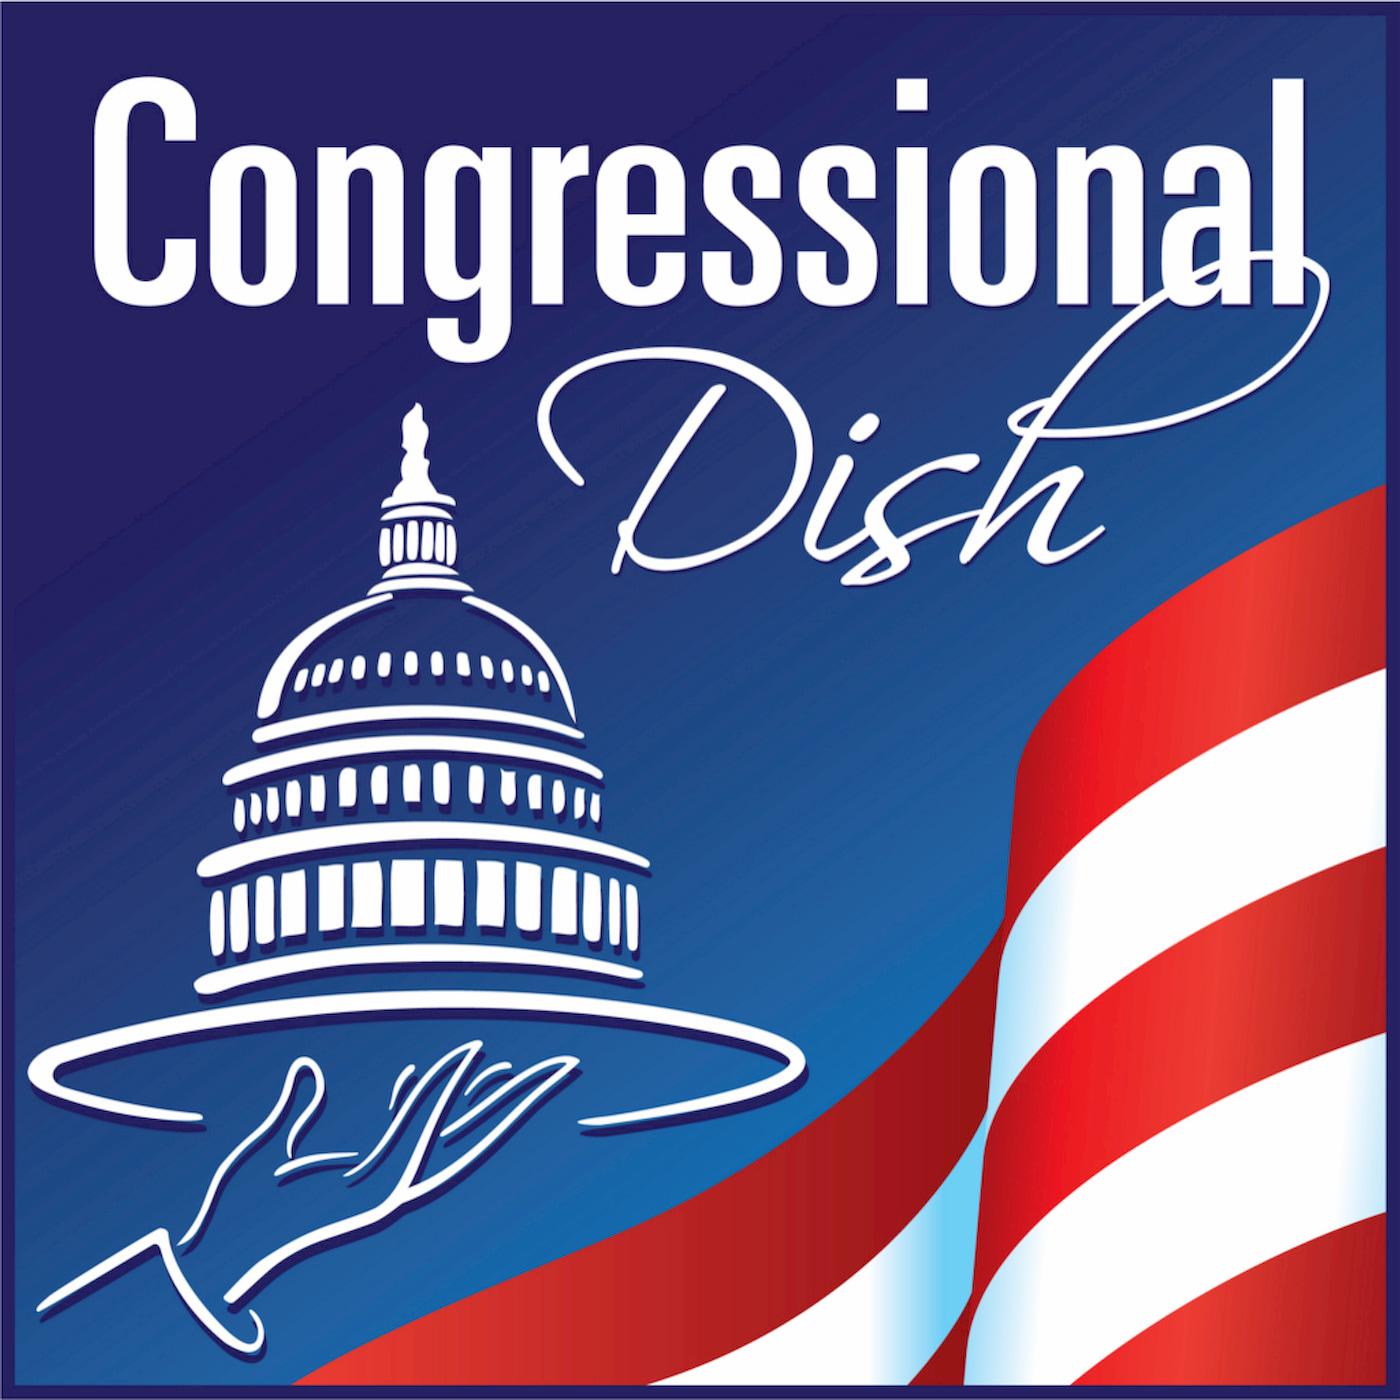 Congressional Dish Episodes on Podchaser